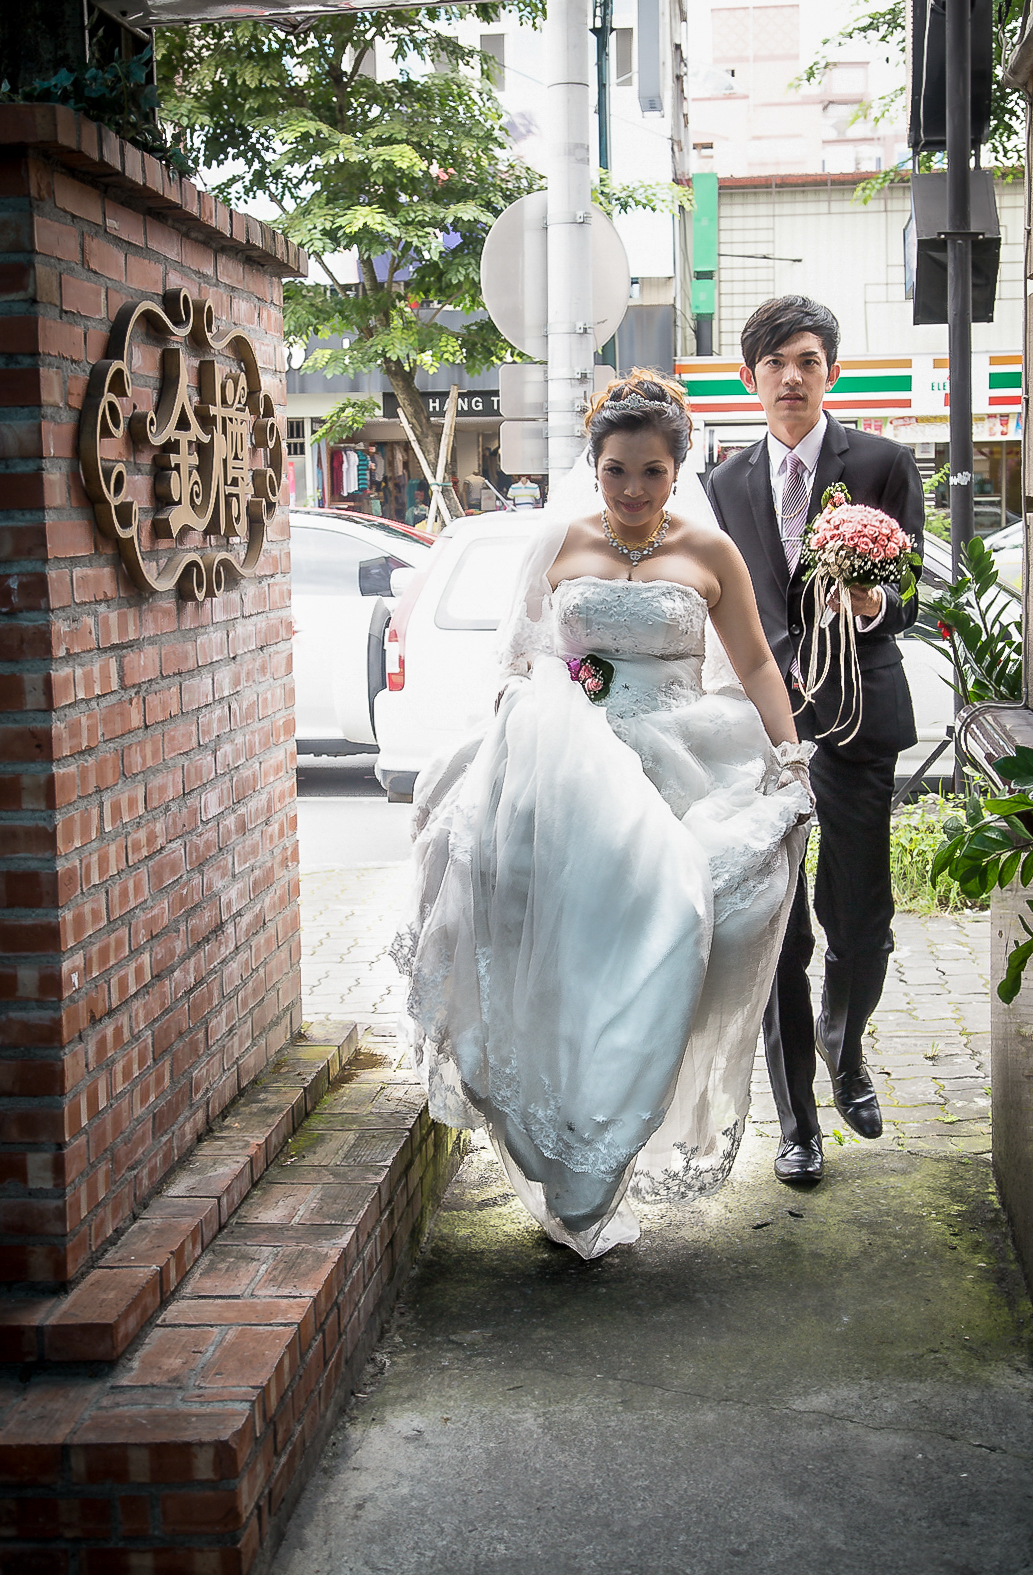 Wedding-婚攝Q比-酷比攝CUBY-PHOTOGRAPHY-宜蘭金樽喜慶宴會廣場-20